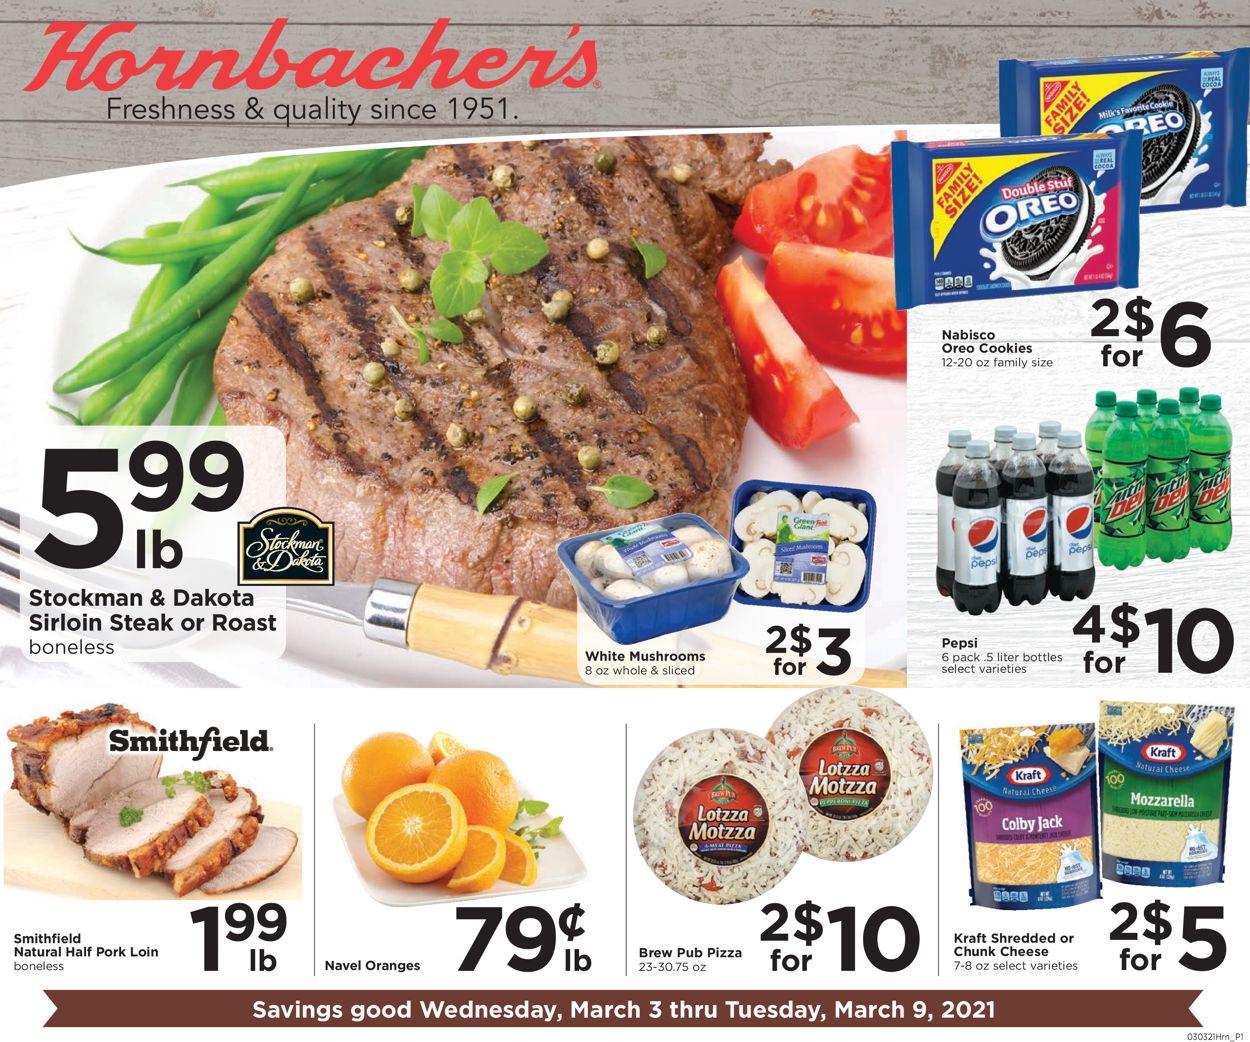 Hornbacher's Weekly Ad Circular - valid 03/03-03/09/2021